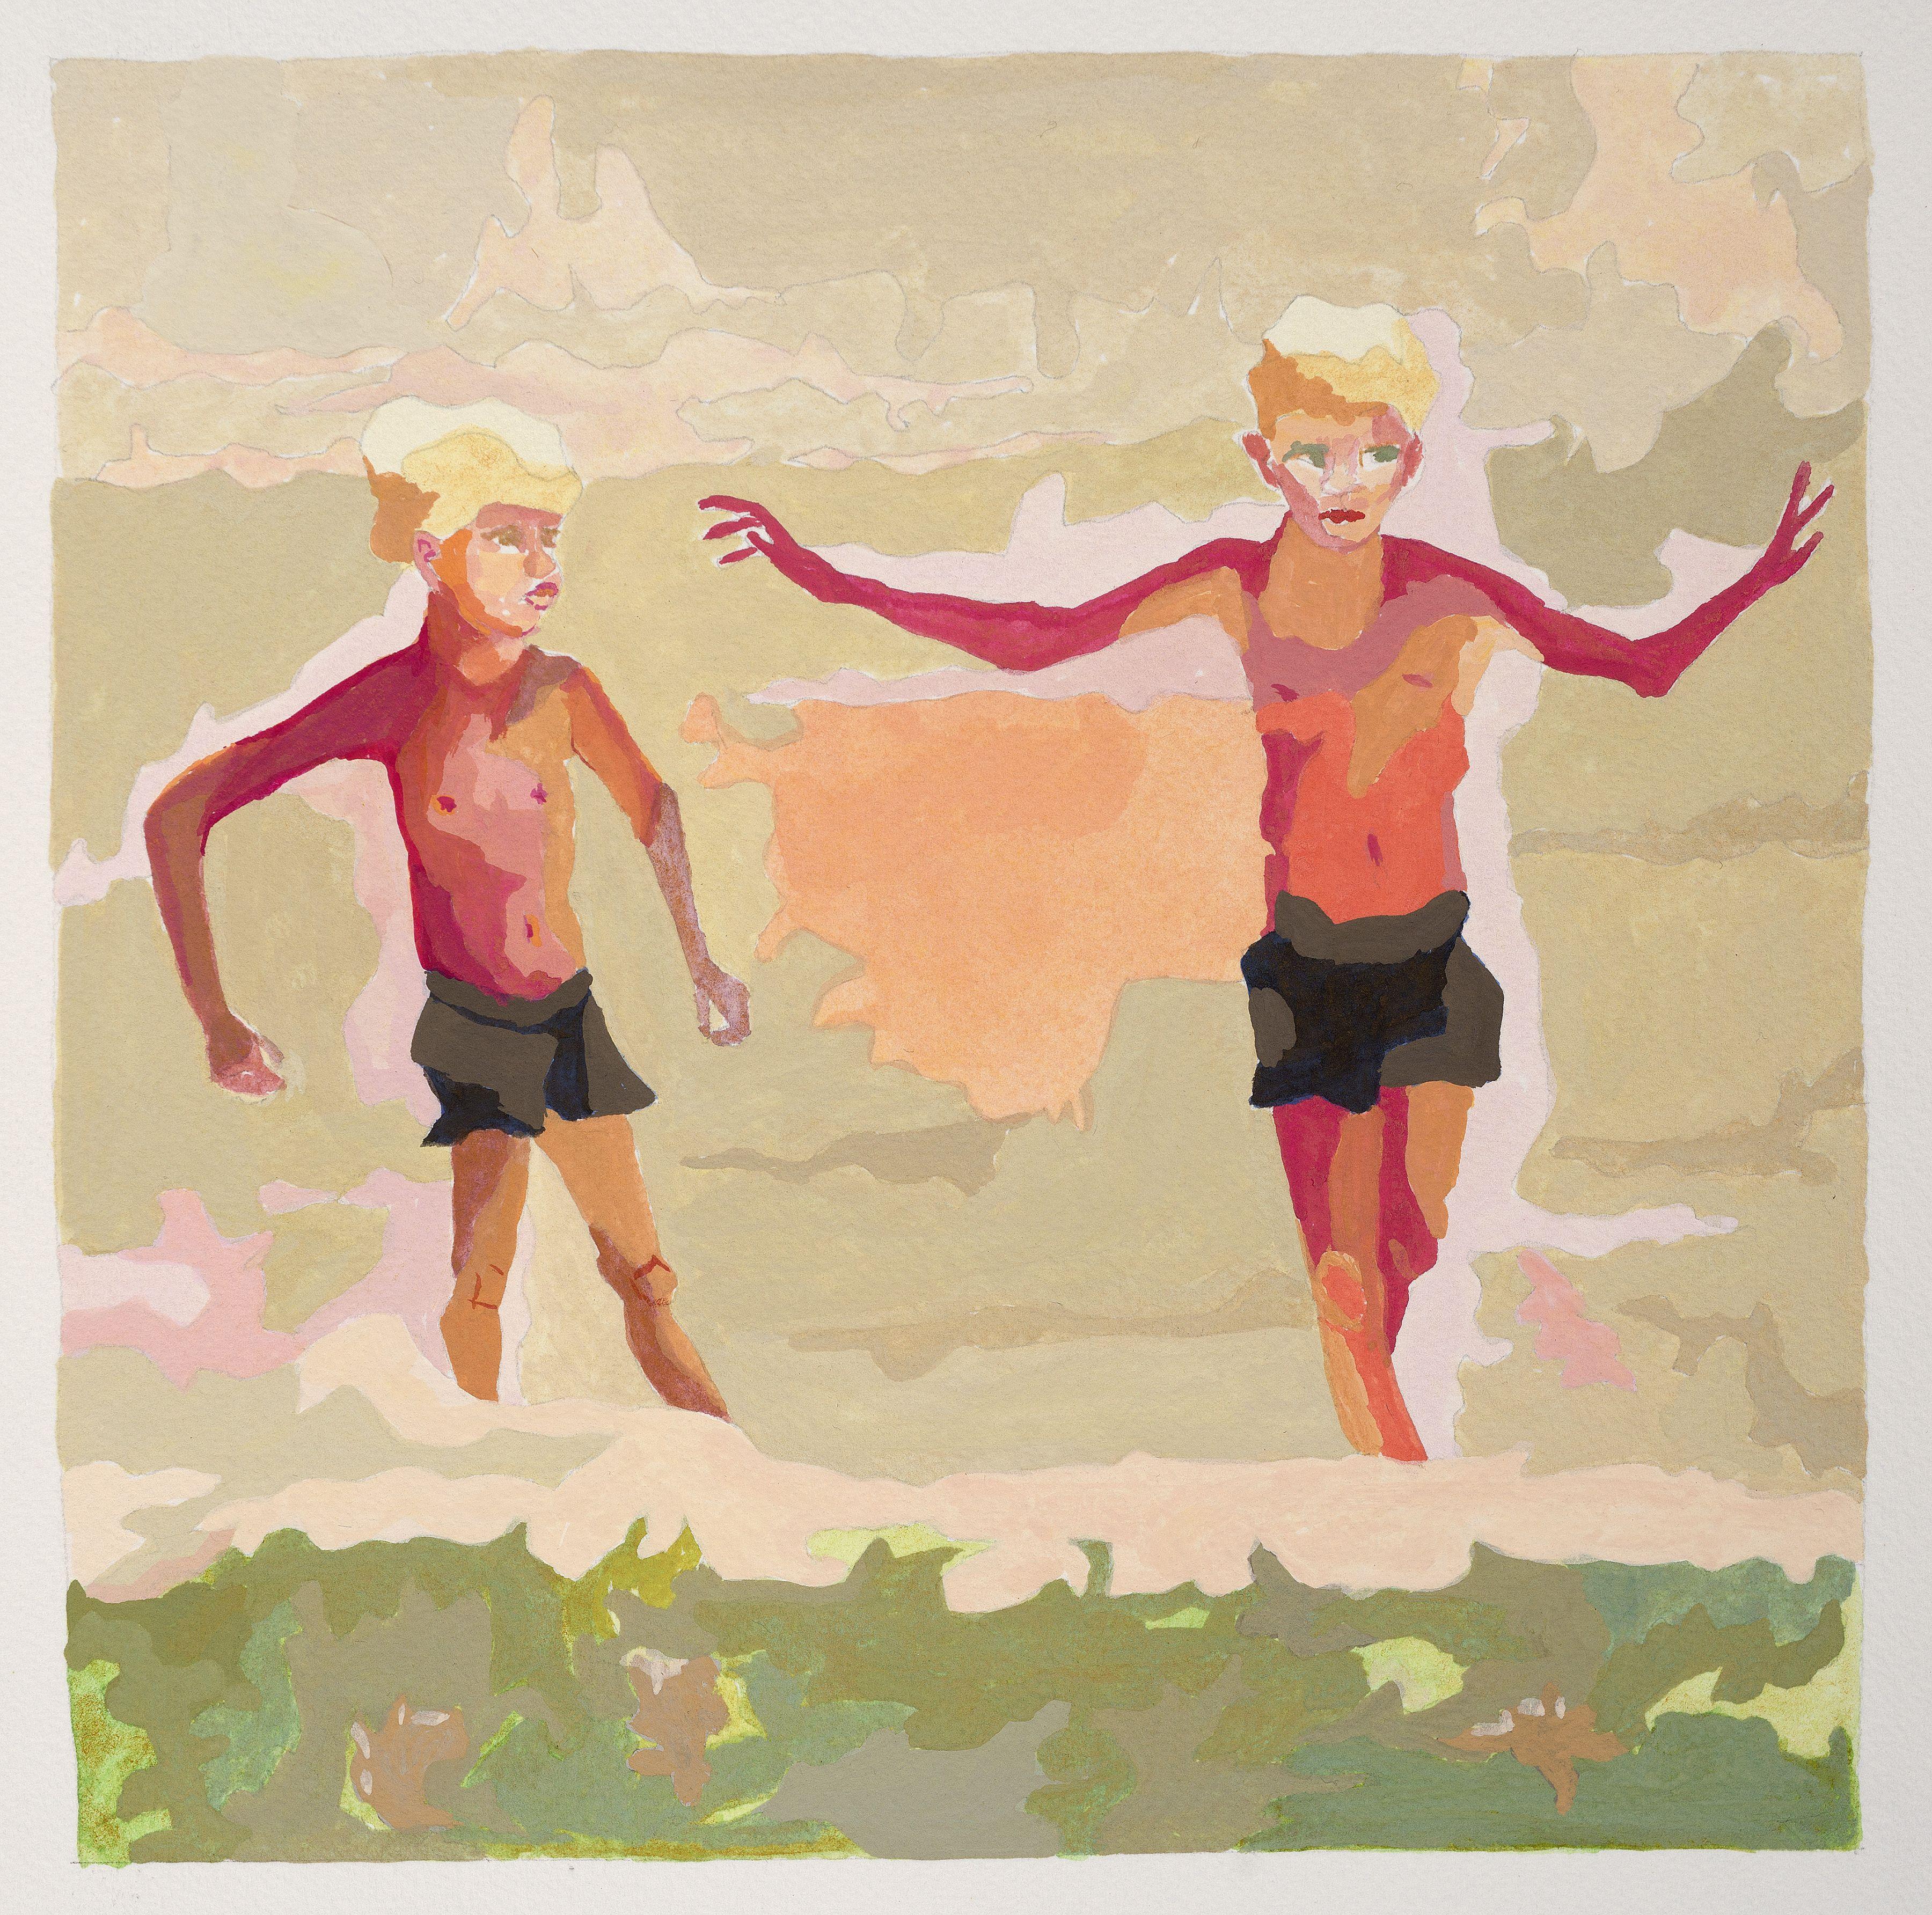 RUTH OWENS, Beach Boys (study), 2018